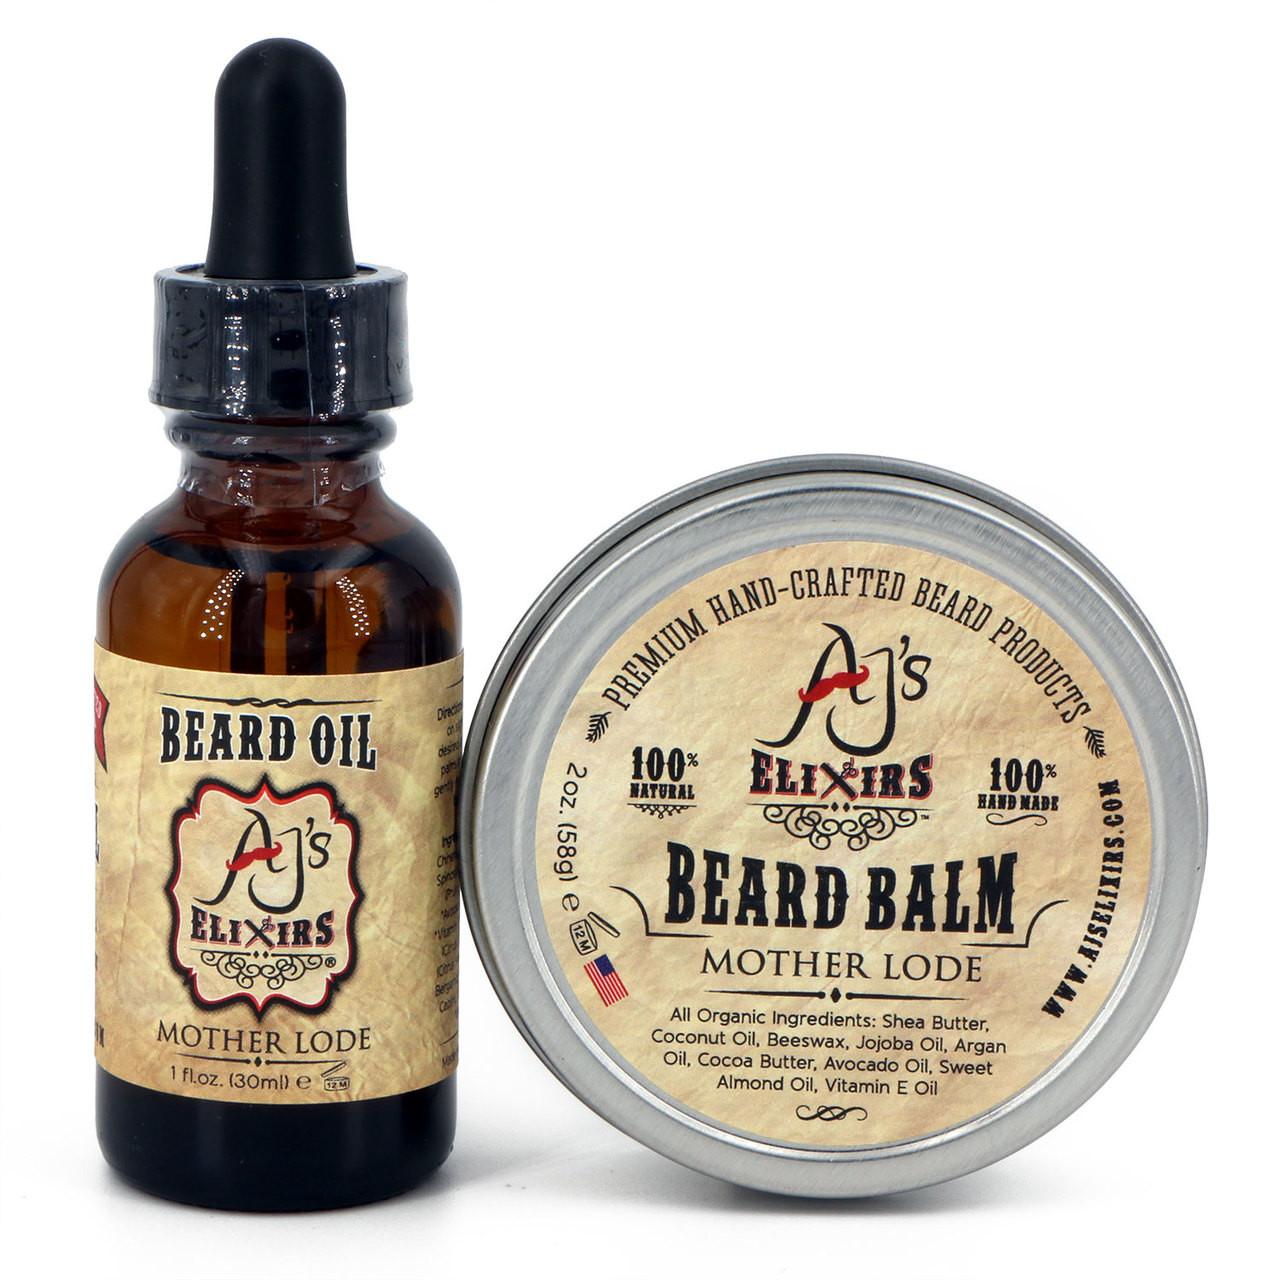 Necessities Beard Bundle - Beard Balm | Beard Oil - AJ's Elixirs